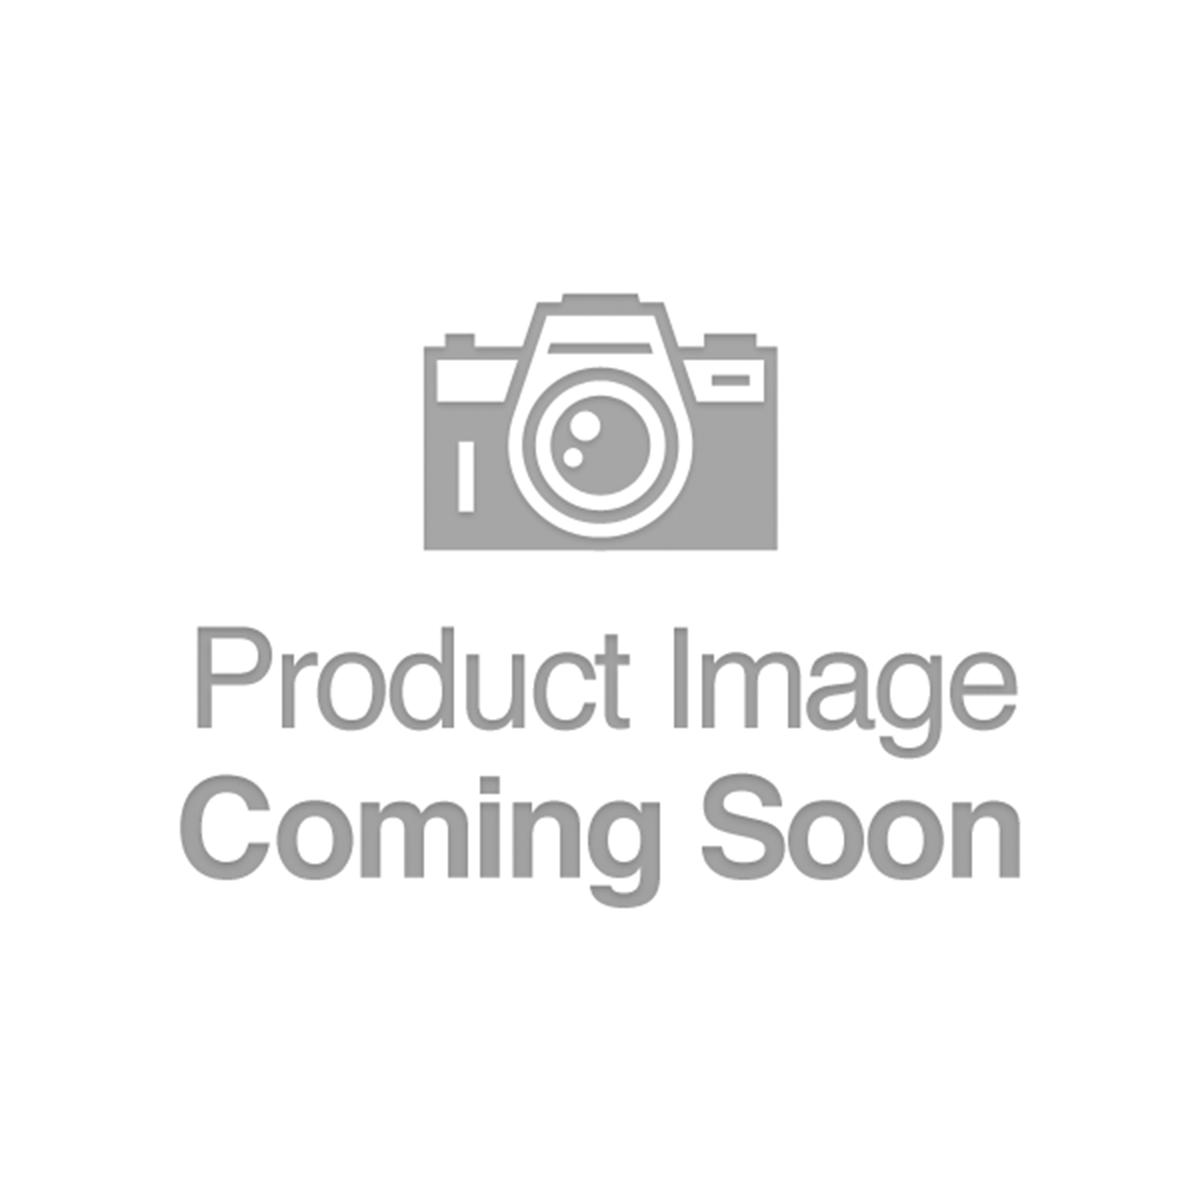 1883 3CN Three Cent Nickel PCGS PR68